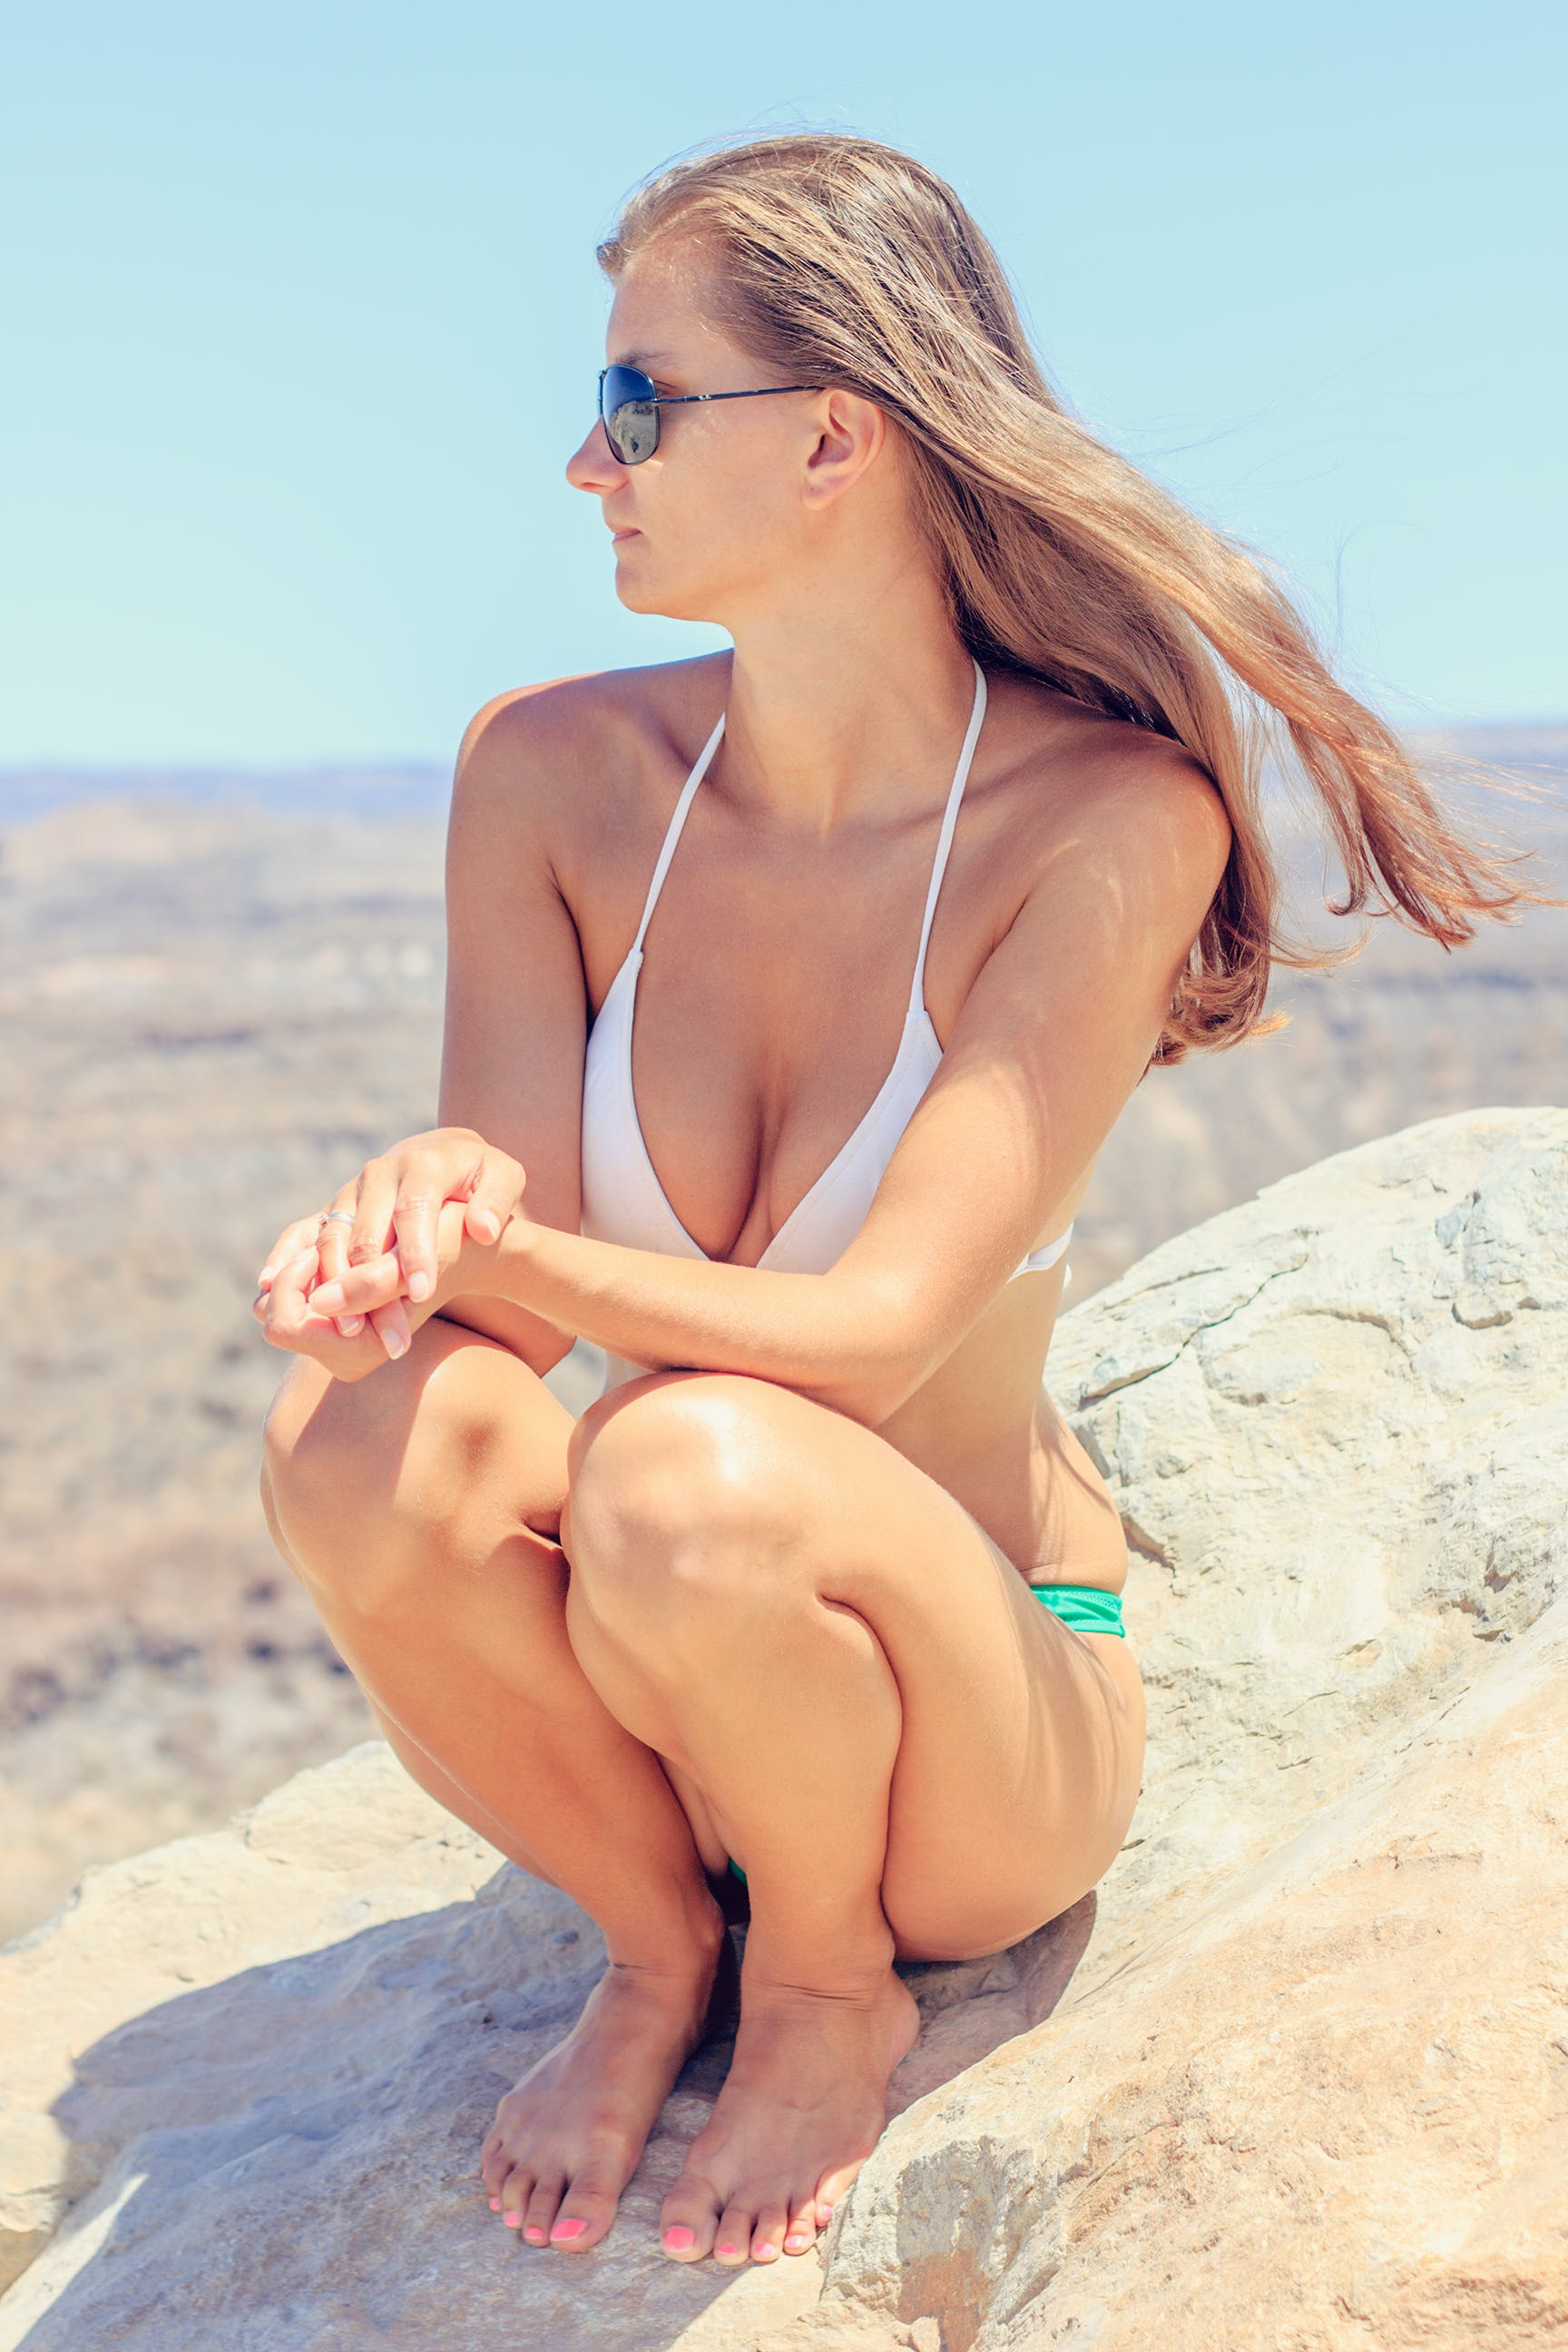 zu badeanzug, bikini, blondes haar, felsen